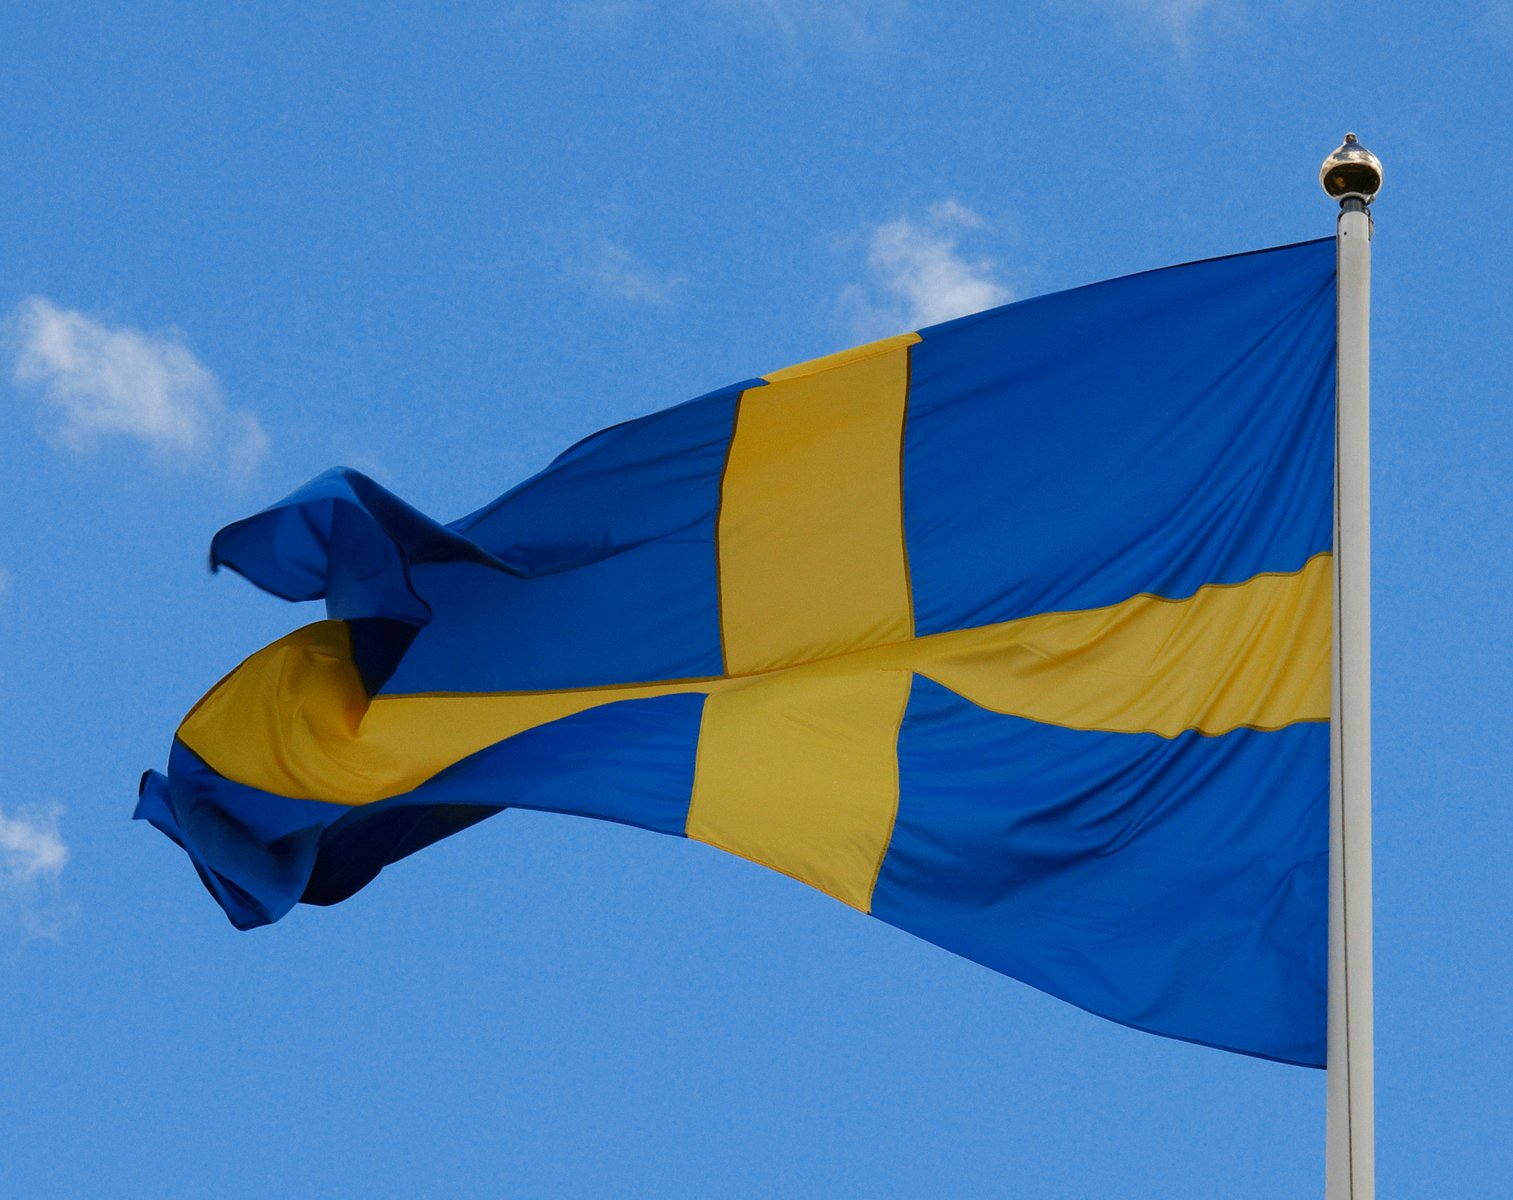 Köp db X-trackers ETF:er i Sverige inte i Tyskland